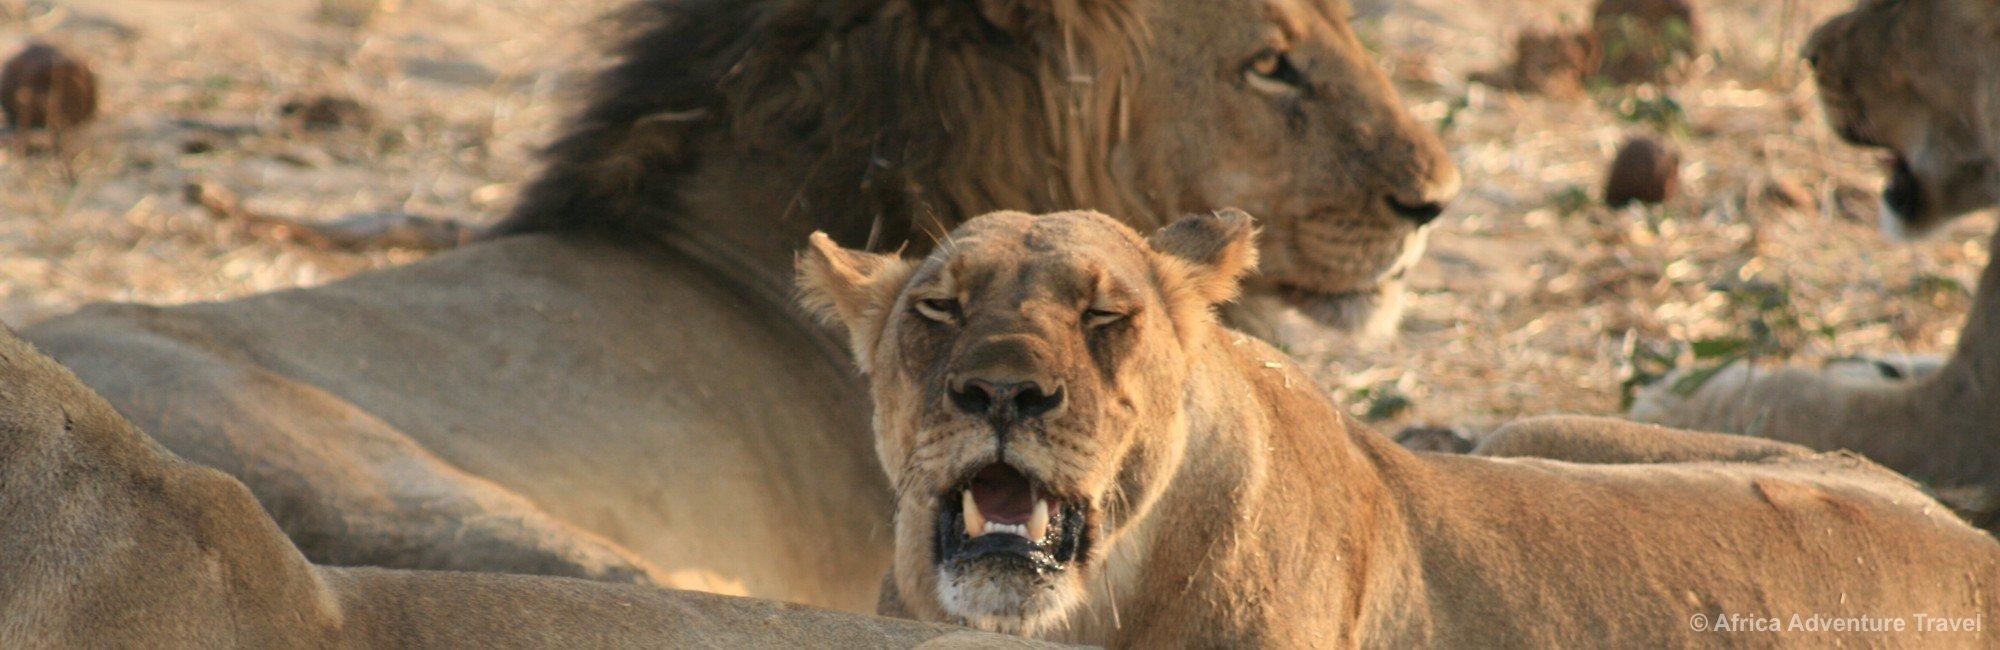 hwange-lions.jpg